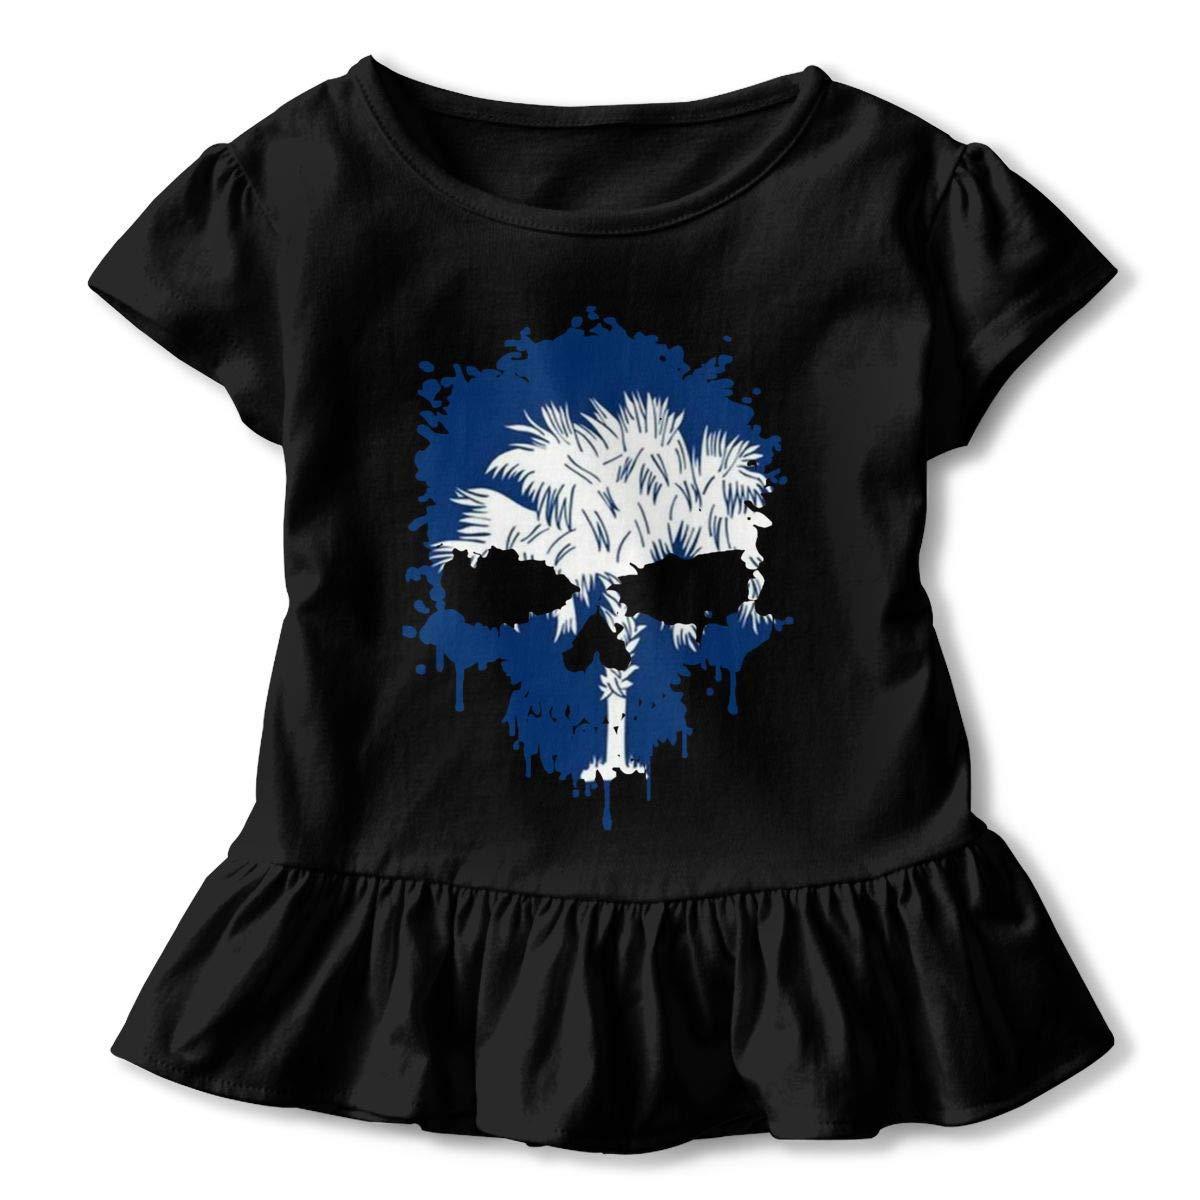 Short-Sleeve South Carolina Skull Shirts for Children Ruffled Tunic Tops with Falbala 2-6T